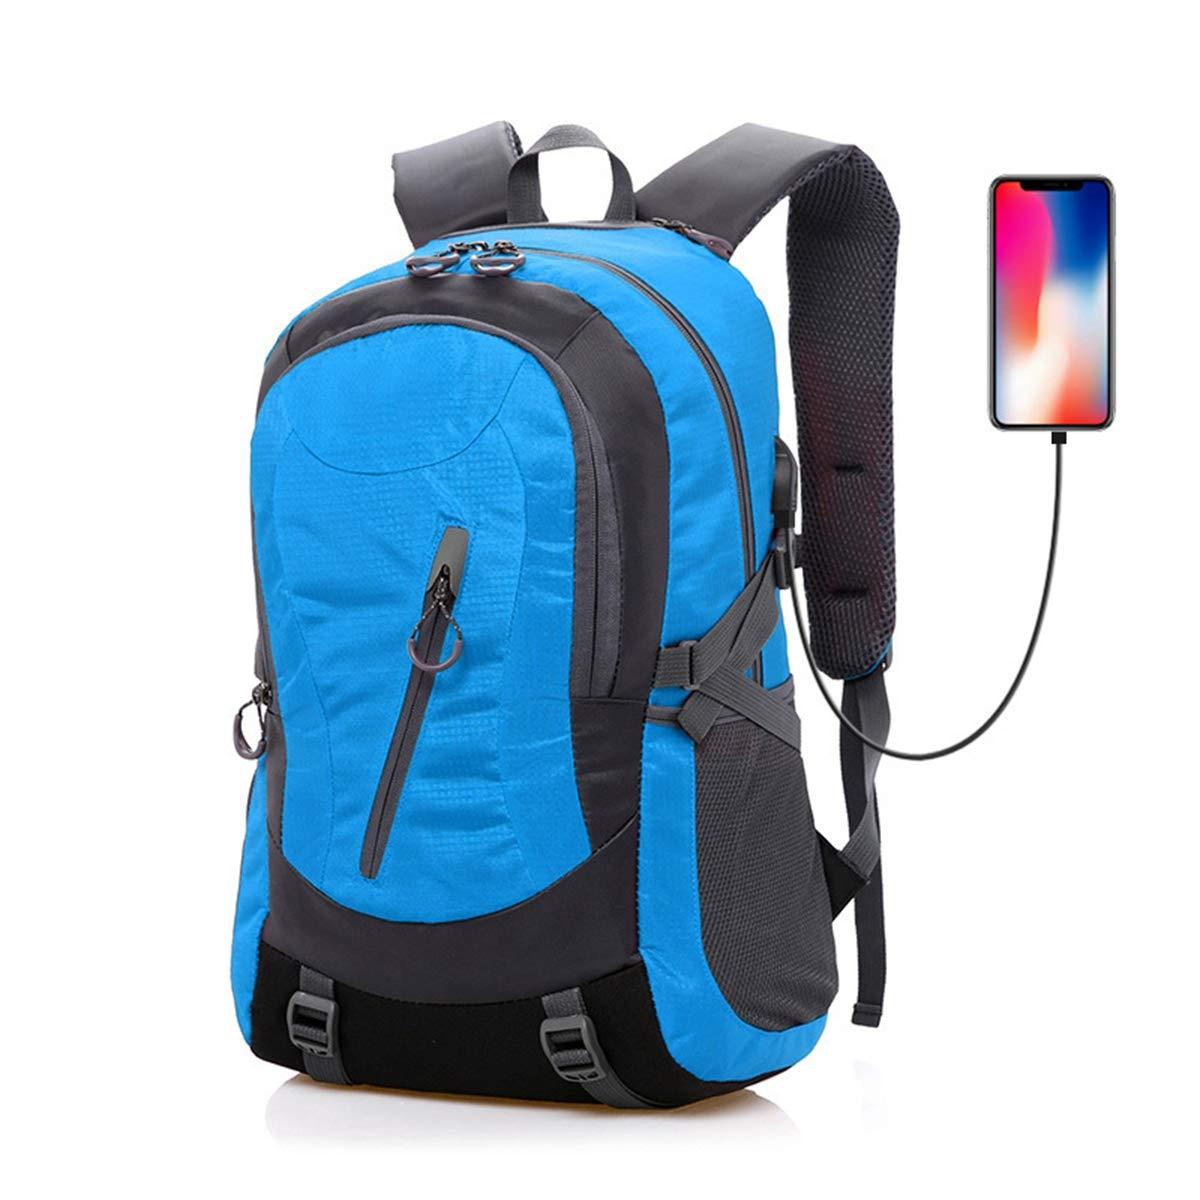 AHWZ 35l スポーツ アウトドア バックパック 防水 ハイキング バッグ メンズ レディース 旅行 バックパック USB充電ポート付き  ブルー B07L4L6NBF